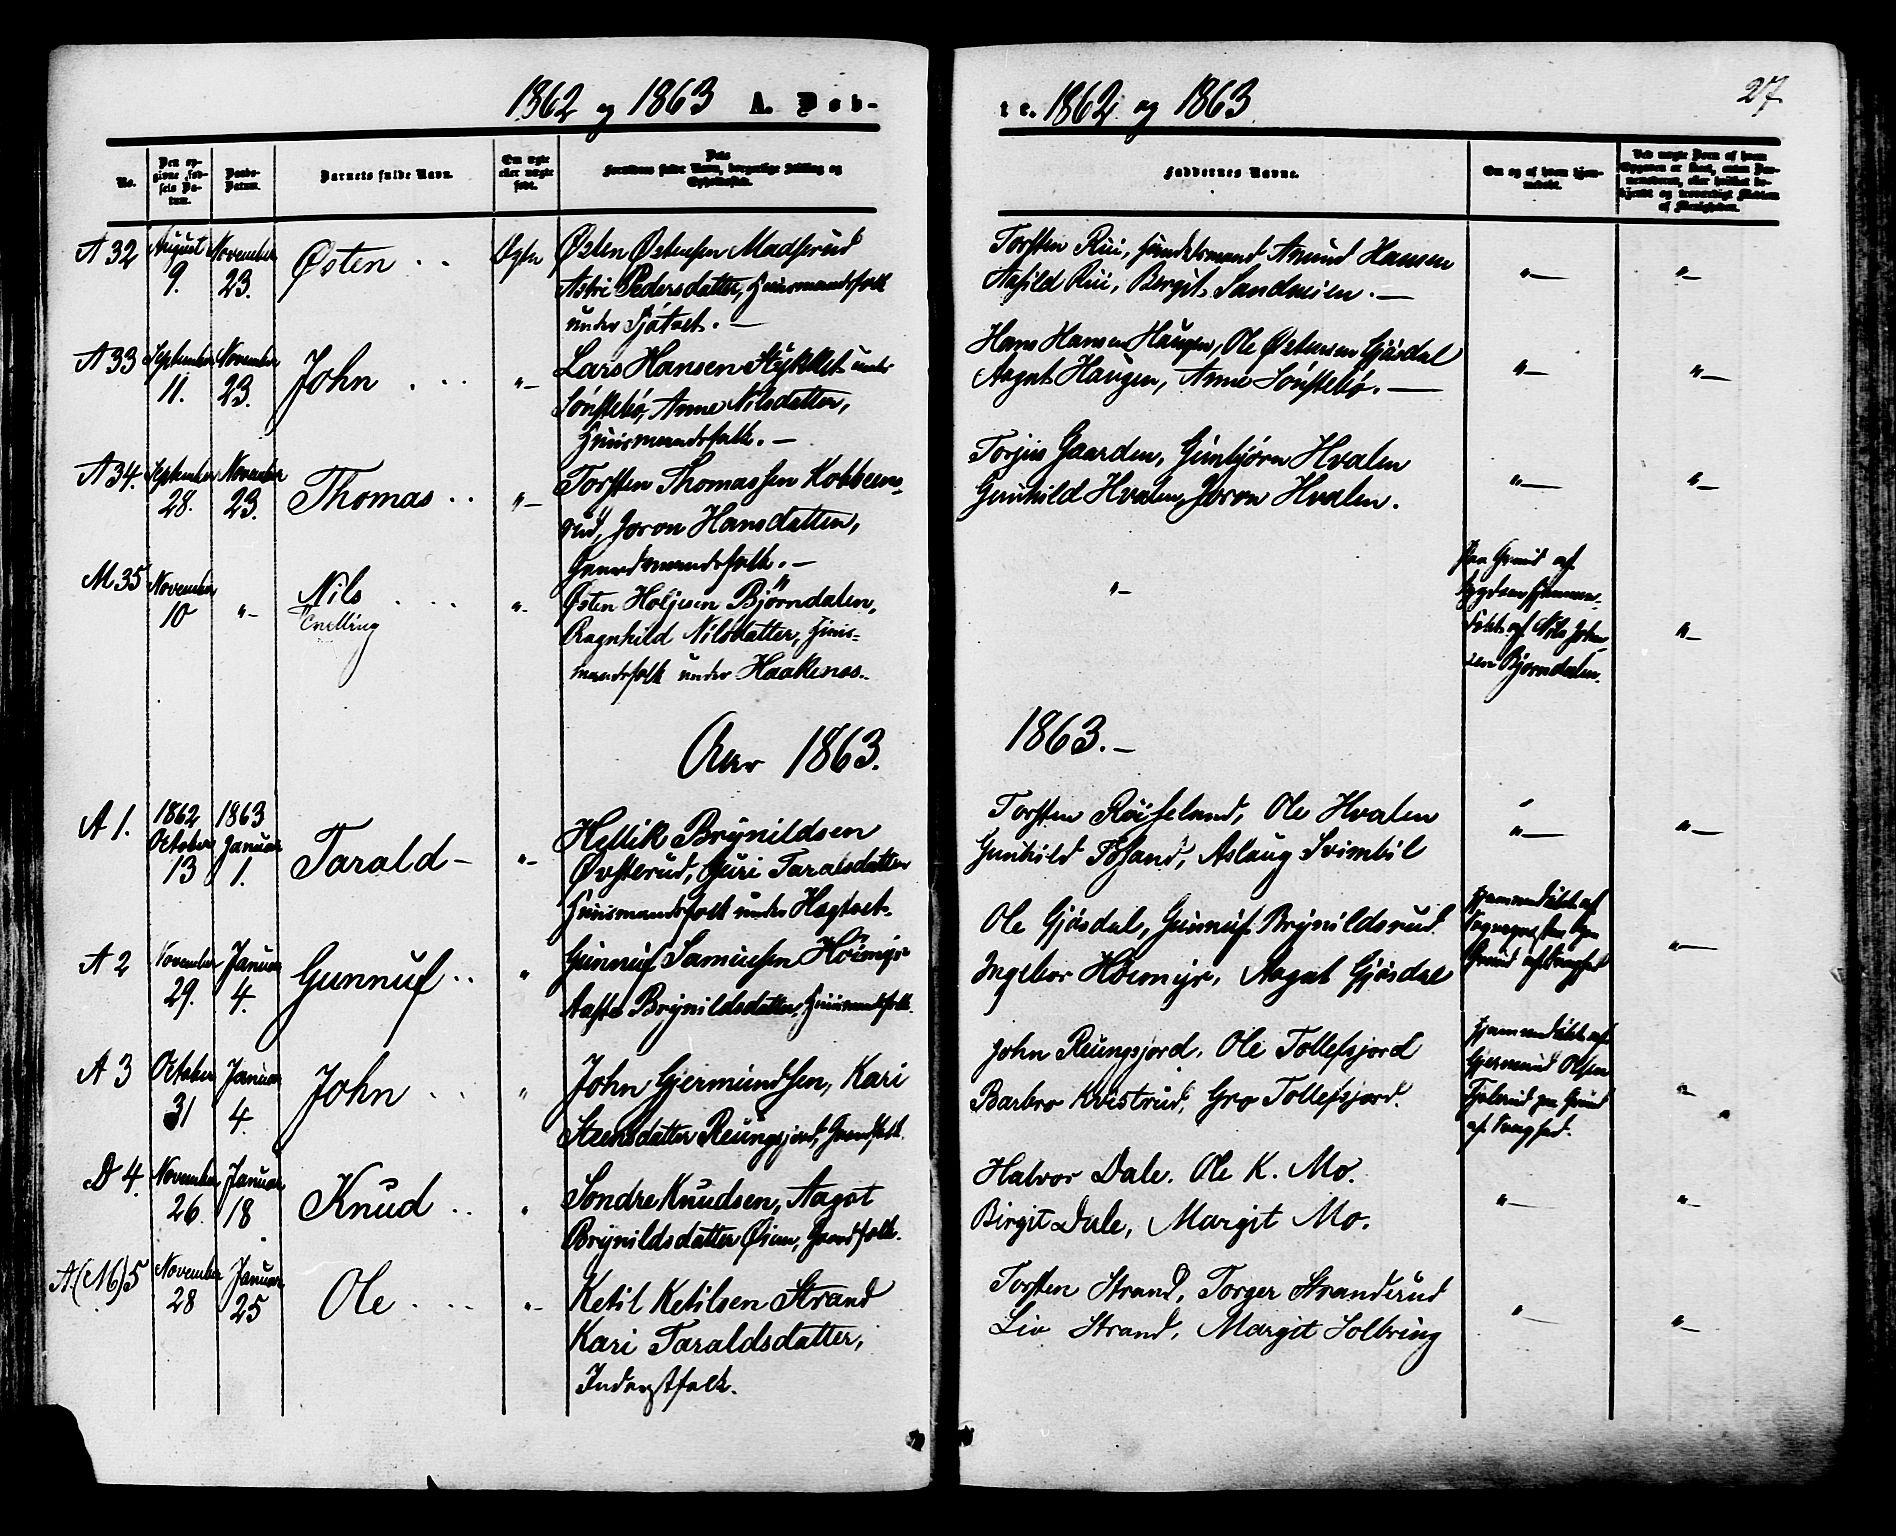 SAKO, Tinn kirkebøker, F/Fa/L0006: Ministerialbok nr. I 6, 1857-1878, s. 27